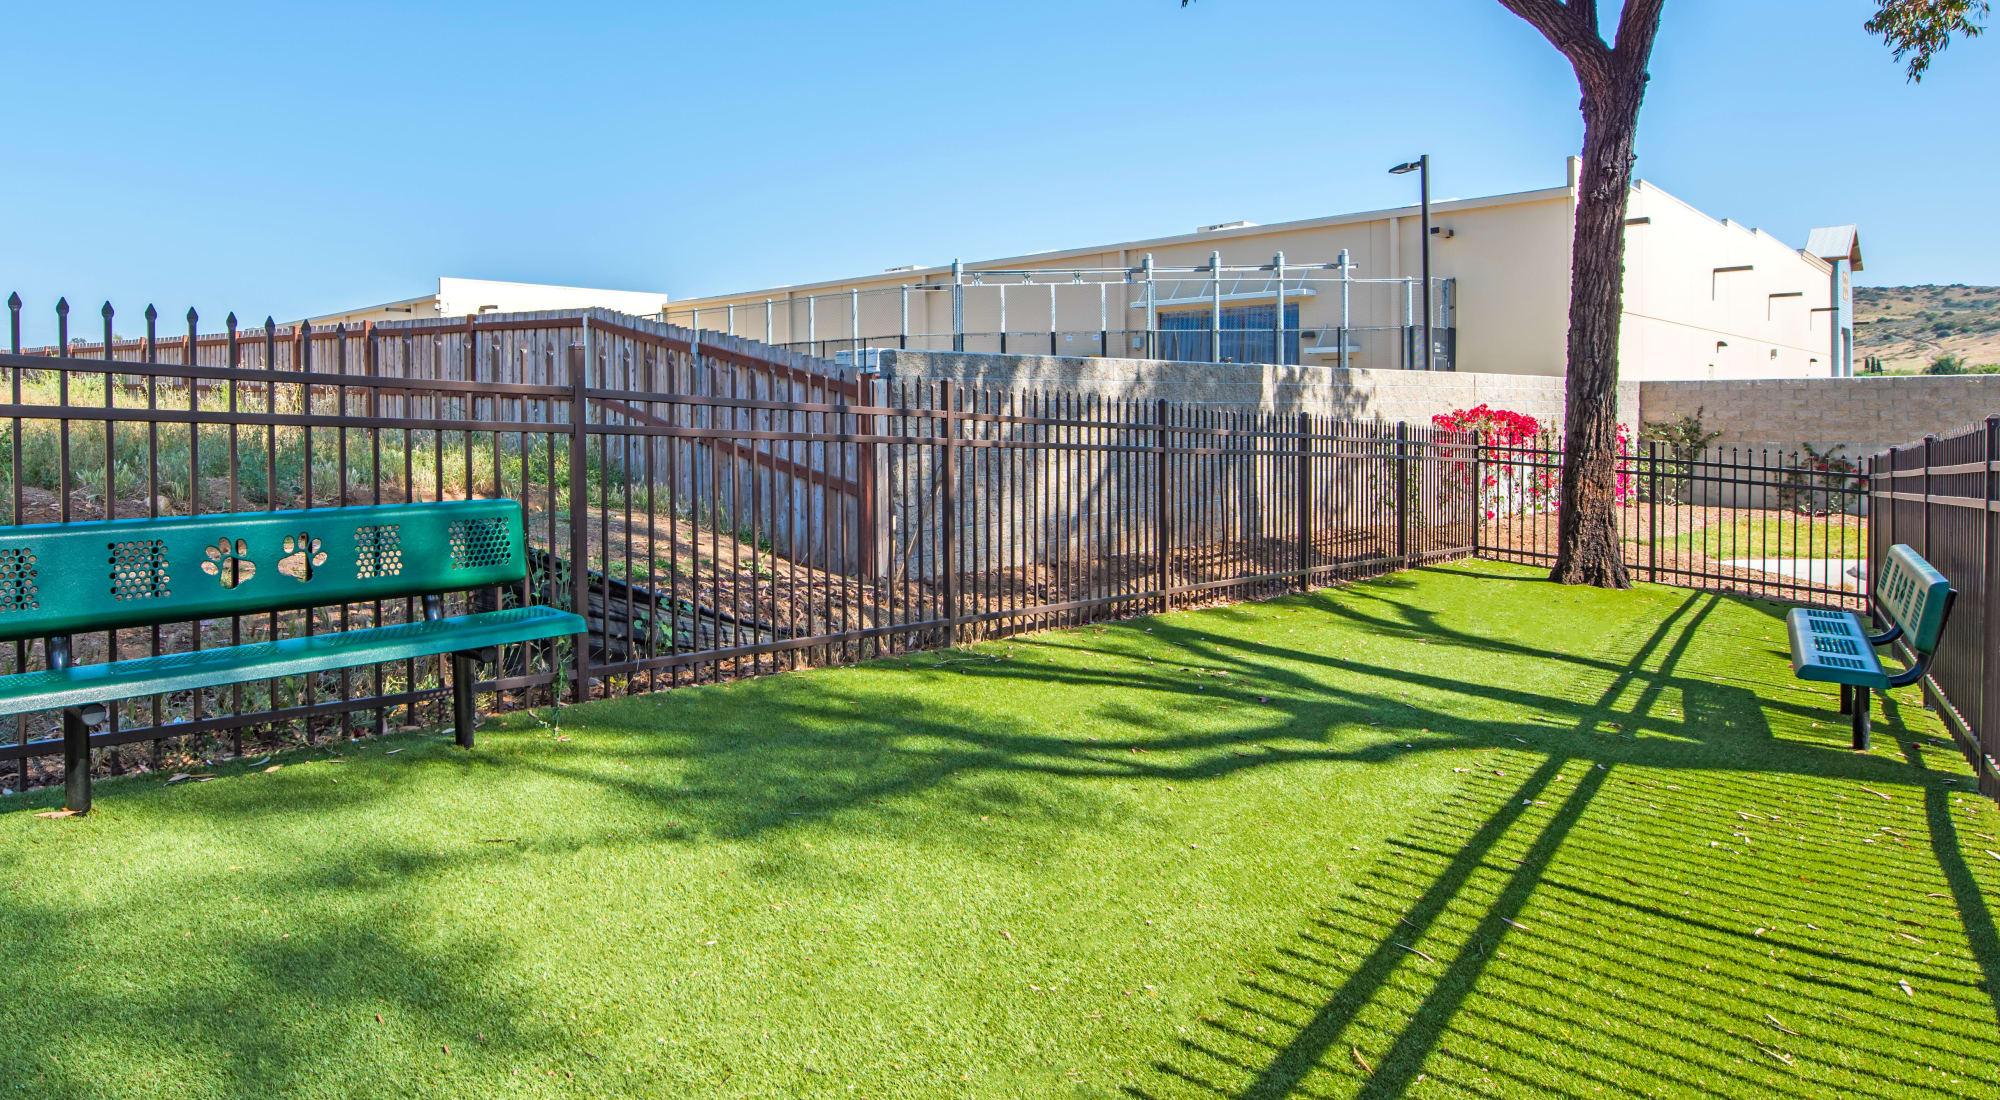 Pet-friendly apartments at Sofi Poway in Poway, California